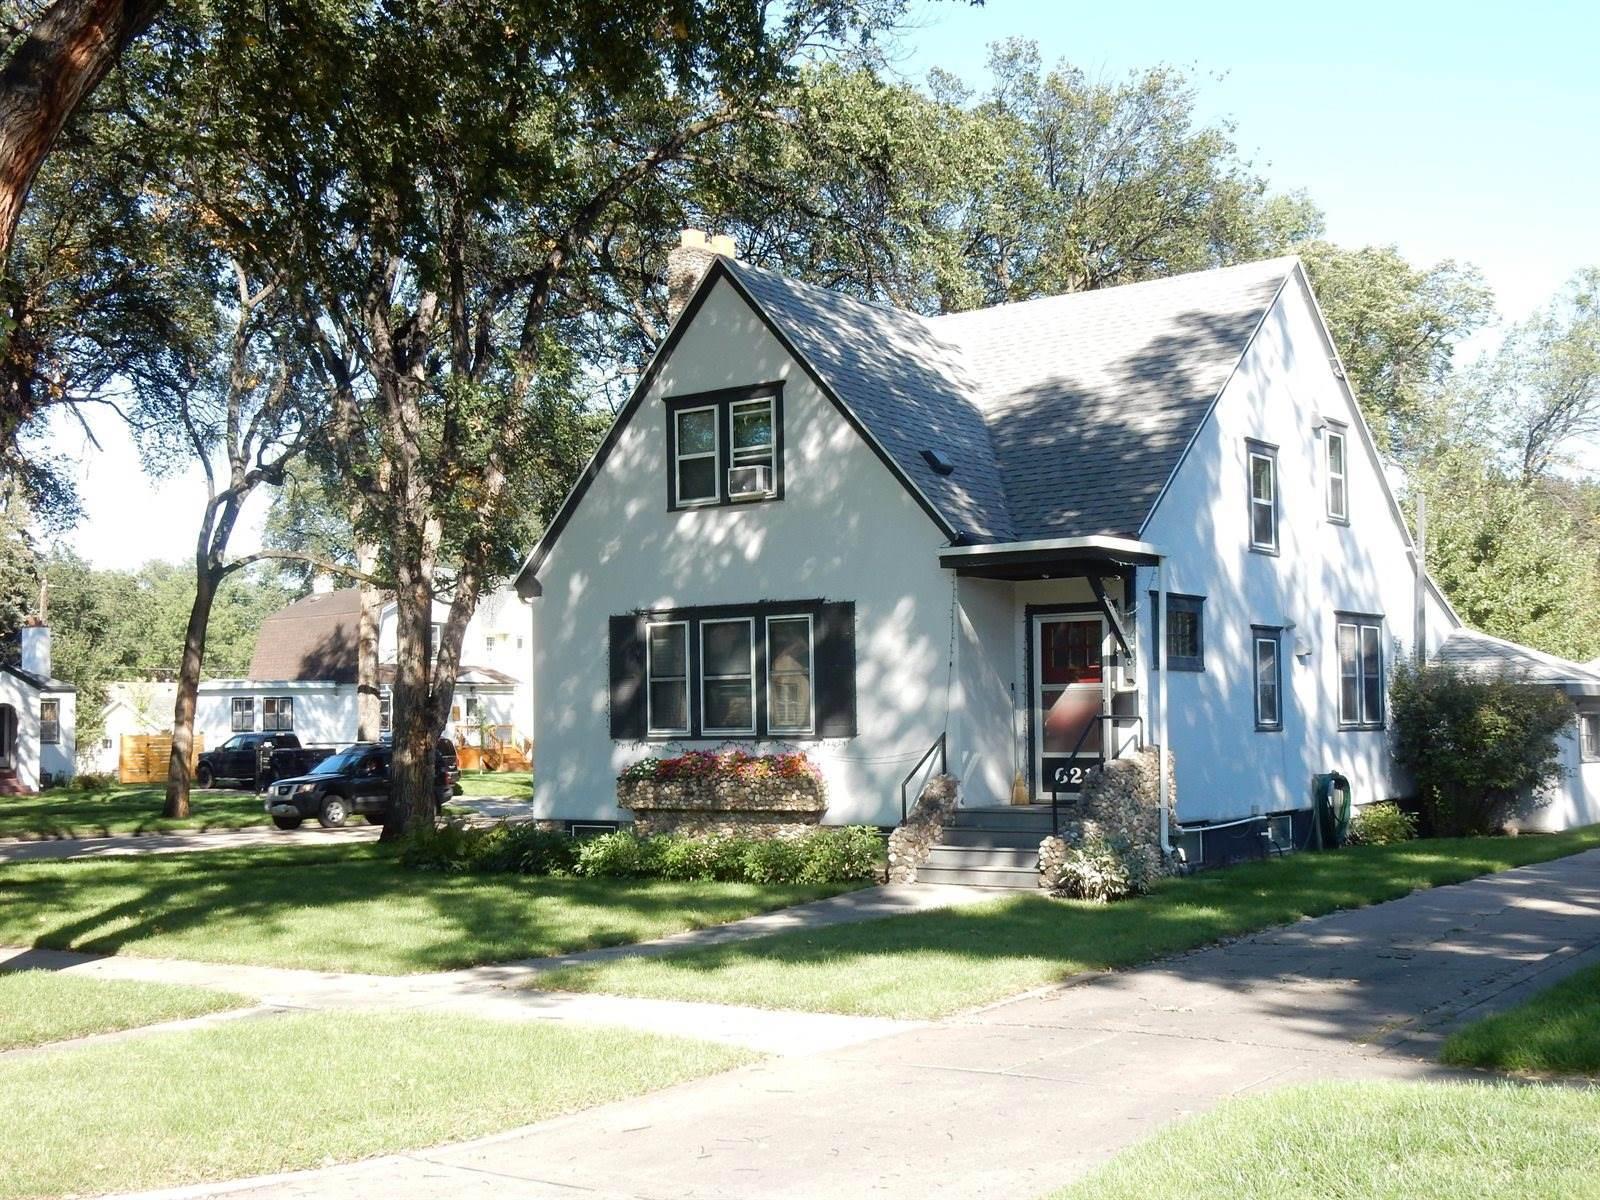 621 Mandan Street, Bismarck, ND 58501